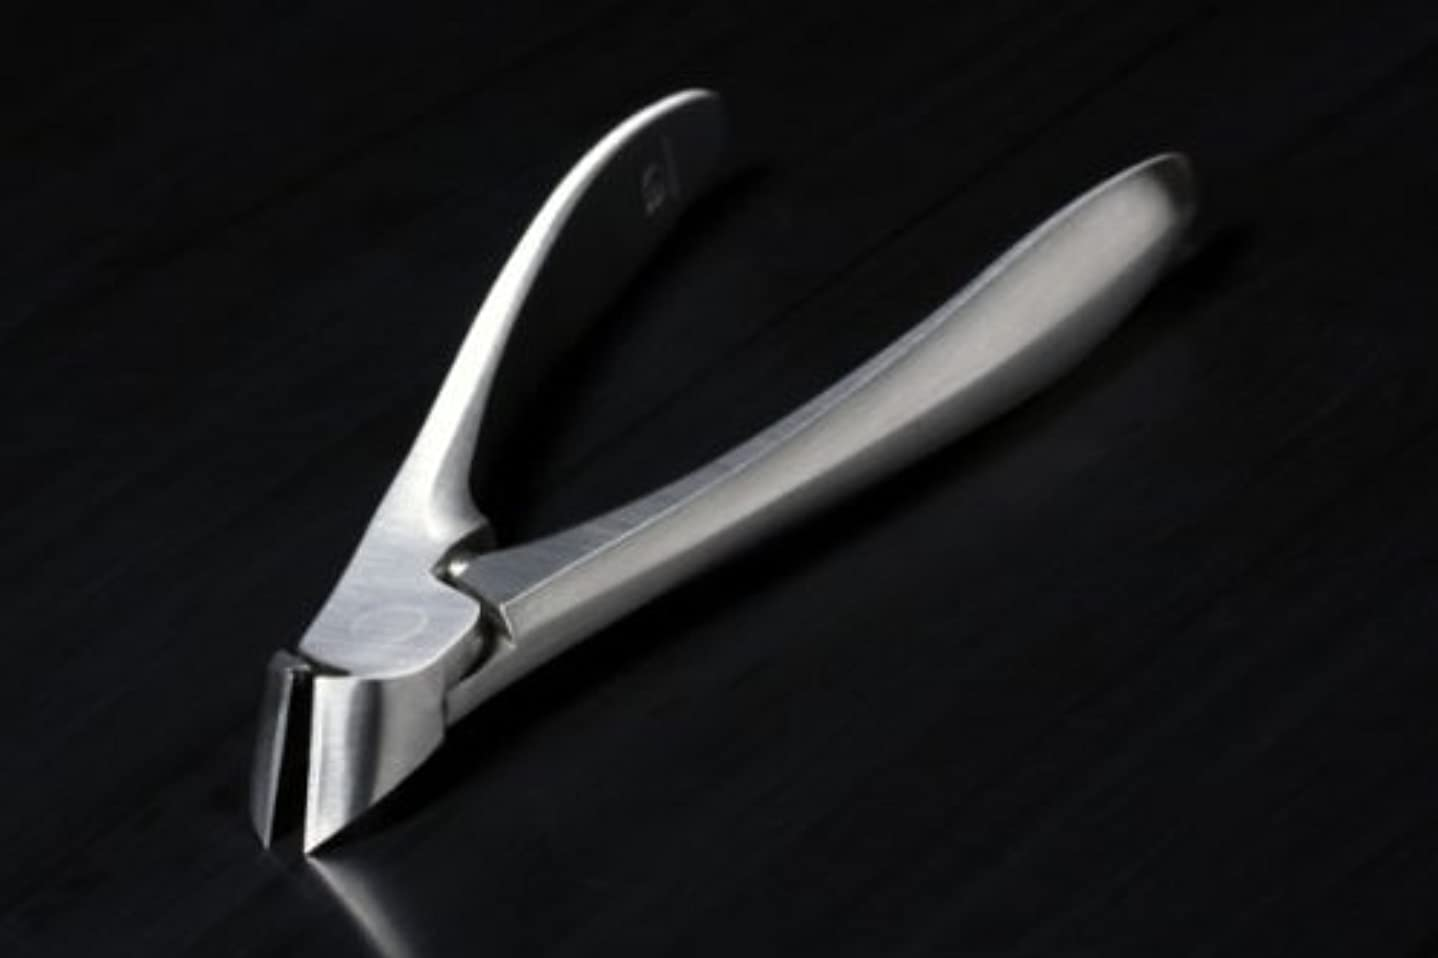 SUWADA (スワダ)爪切り クラシック 足用 (収納ケース付)